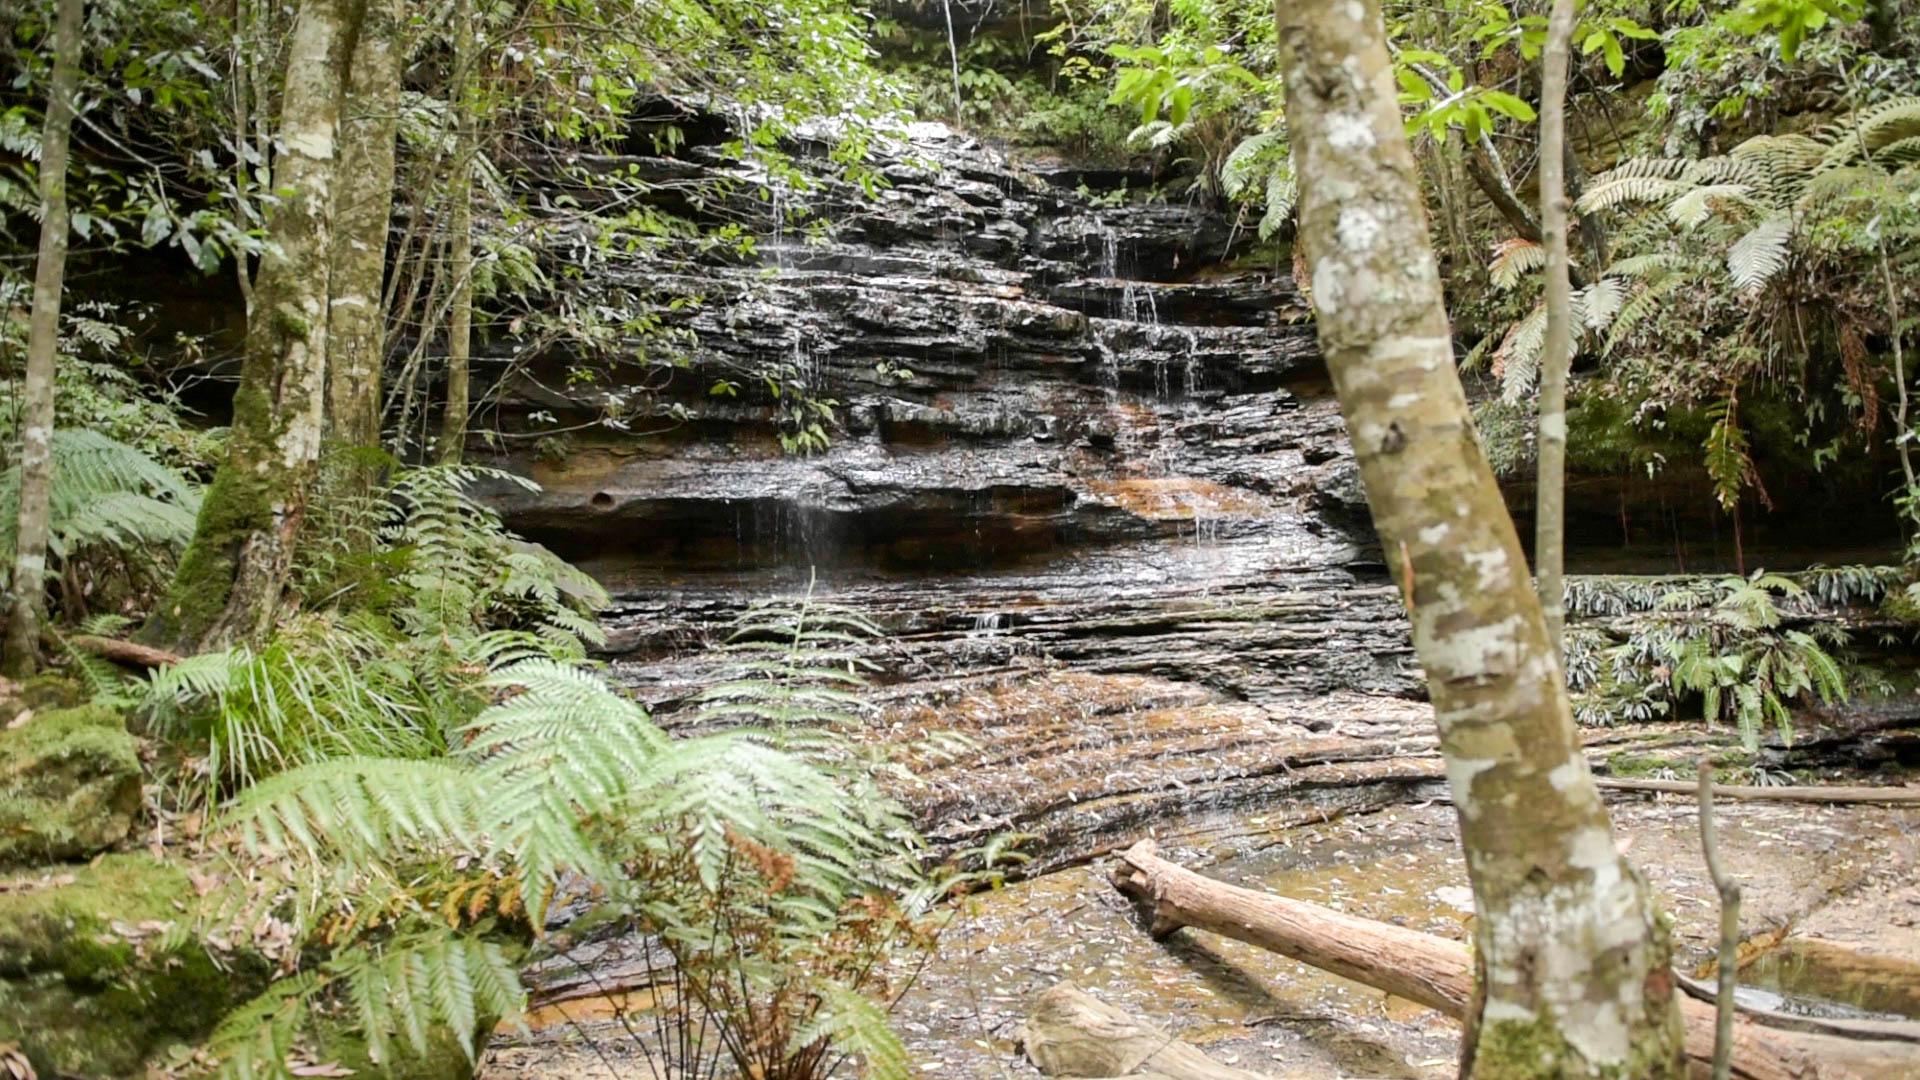 Junctio Falls Lawson Creek. Photo: V Hong